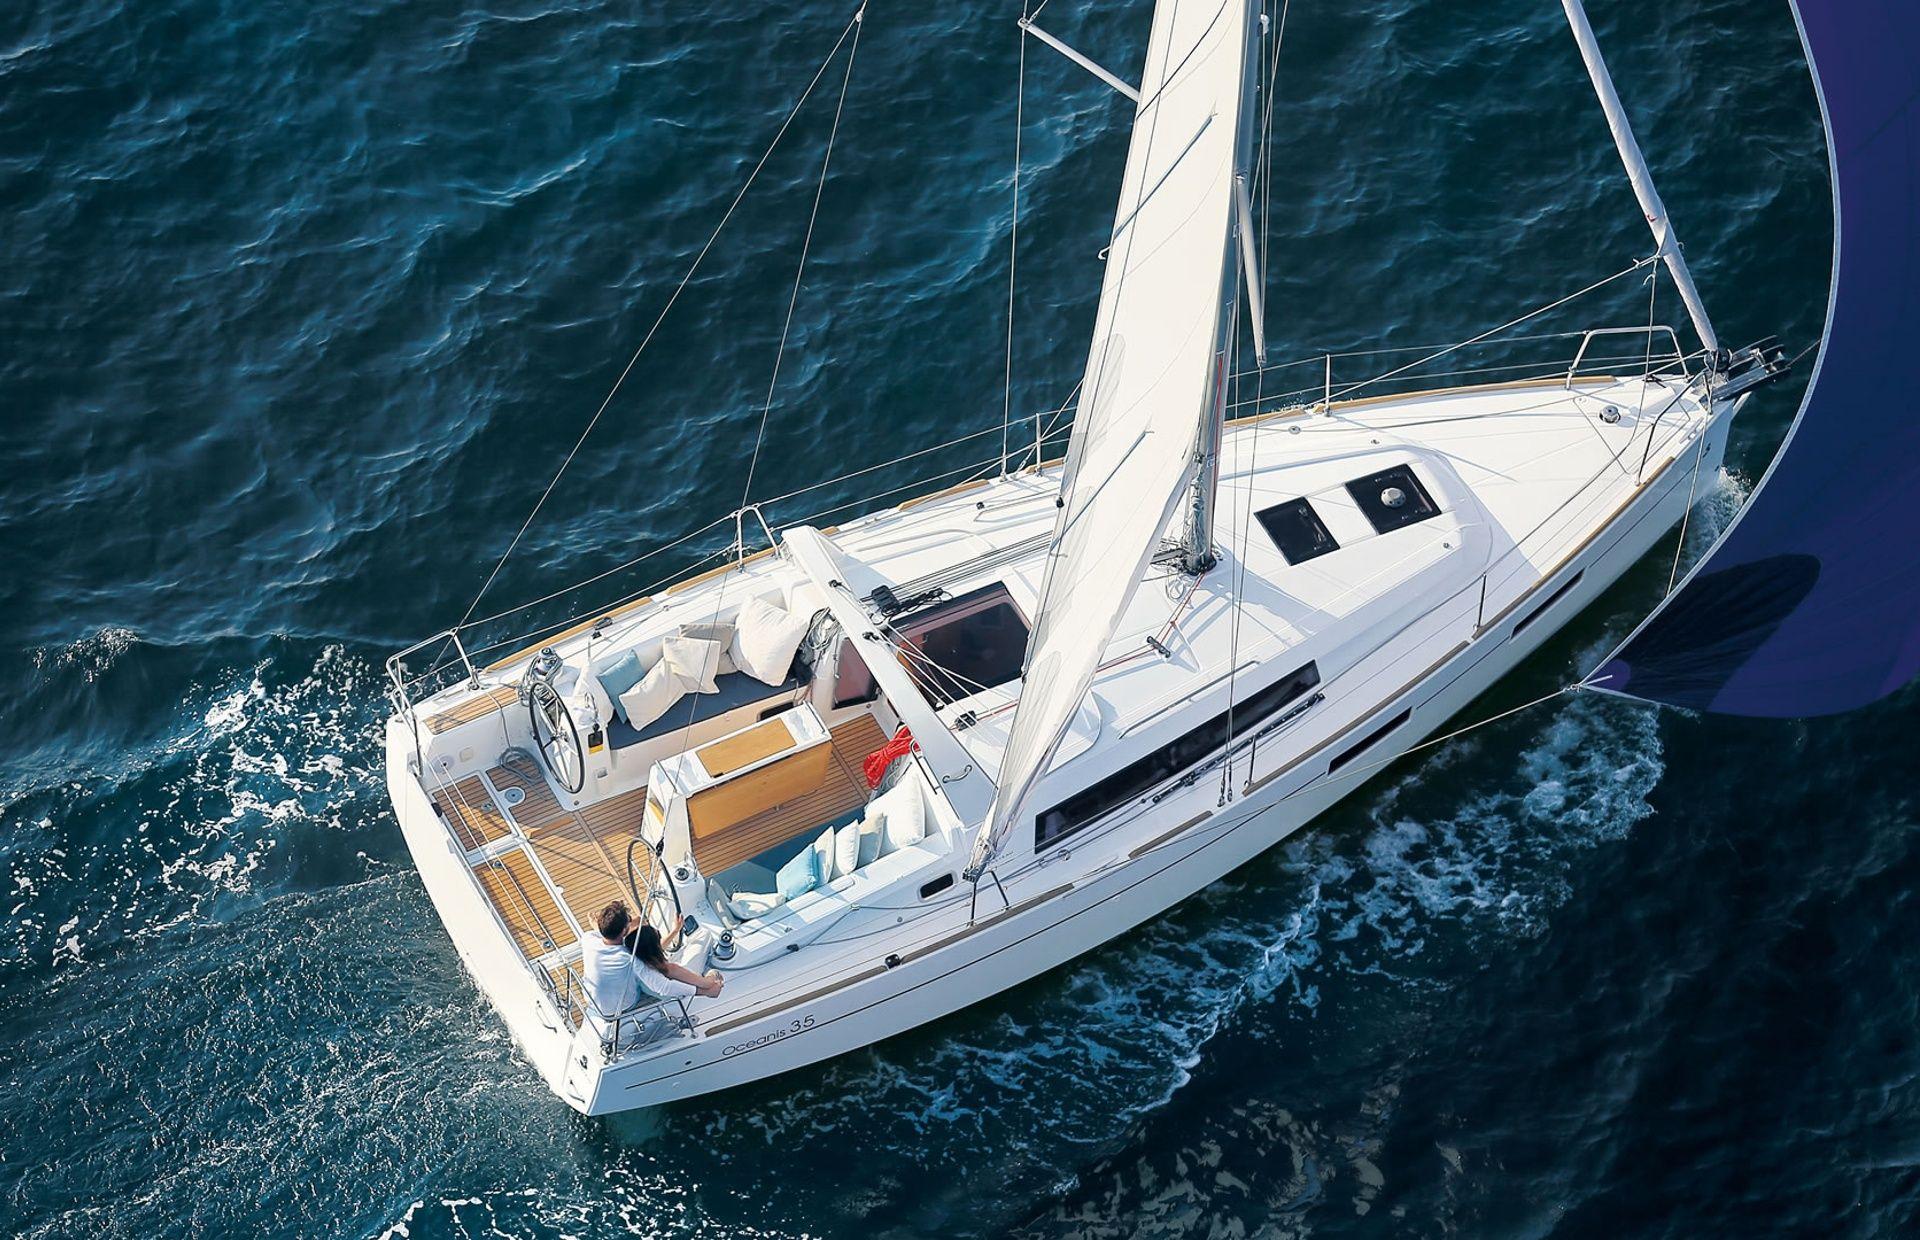 https://media.insailing.com/boat/benenteau-oceanis/image_1574089487571.jpg